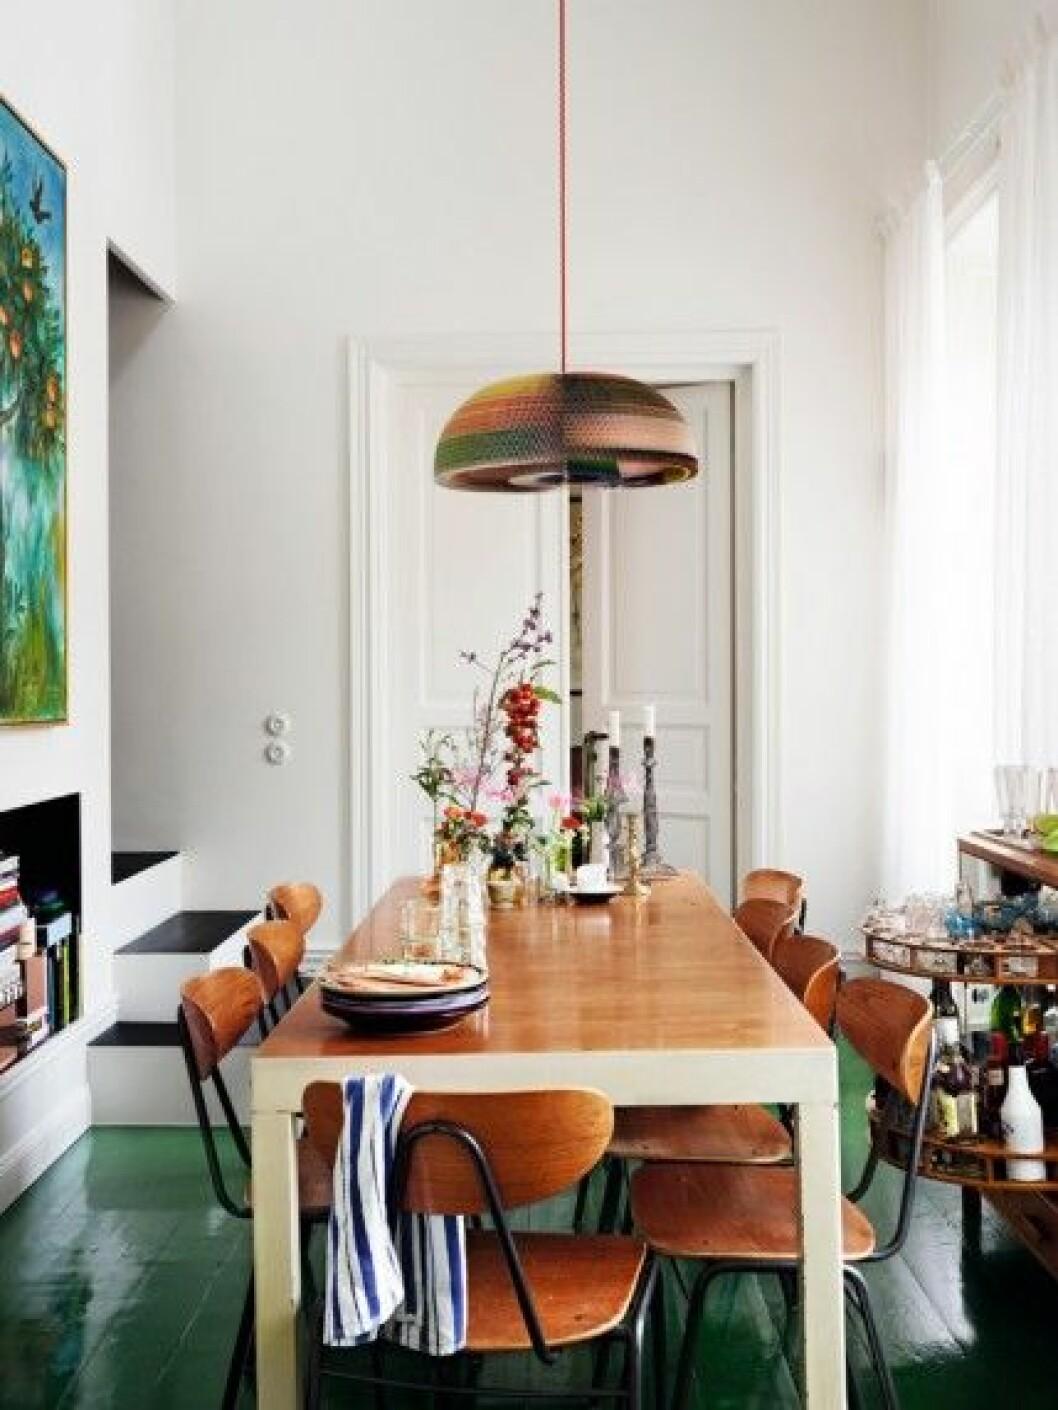 Johan-Svensons-matplats-matbord-malade-golv-foto-idha-lindhag